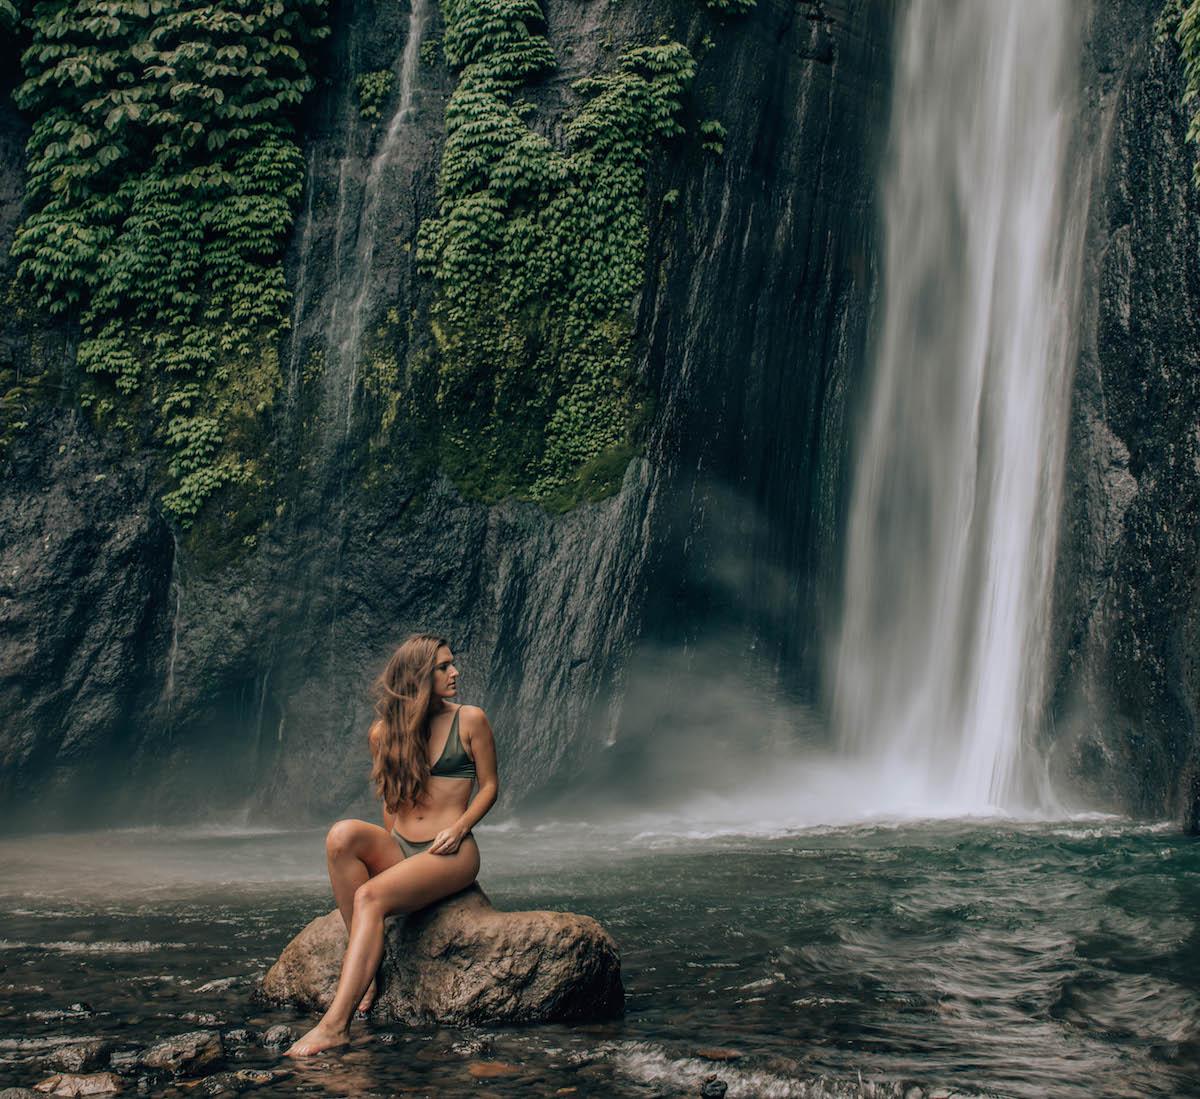 north-bali-waterfalls-munduk.jpg